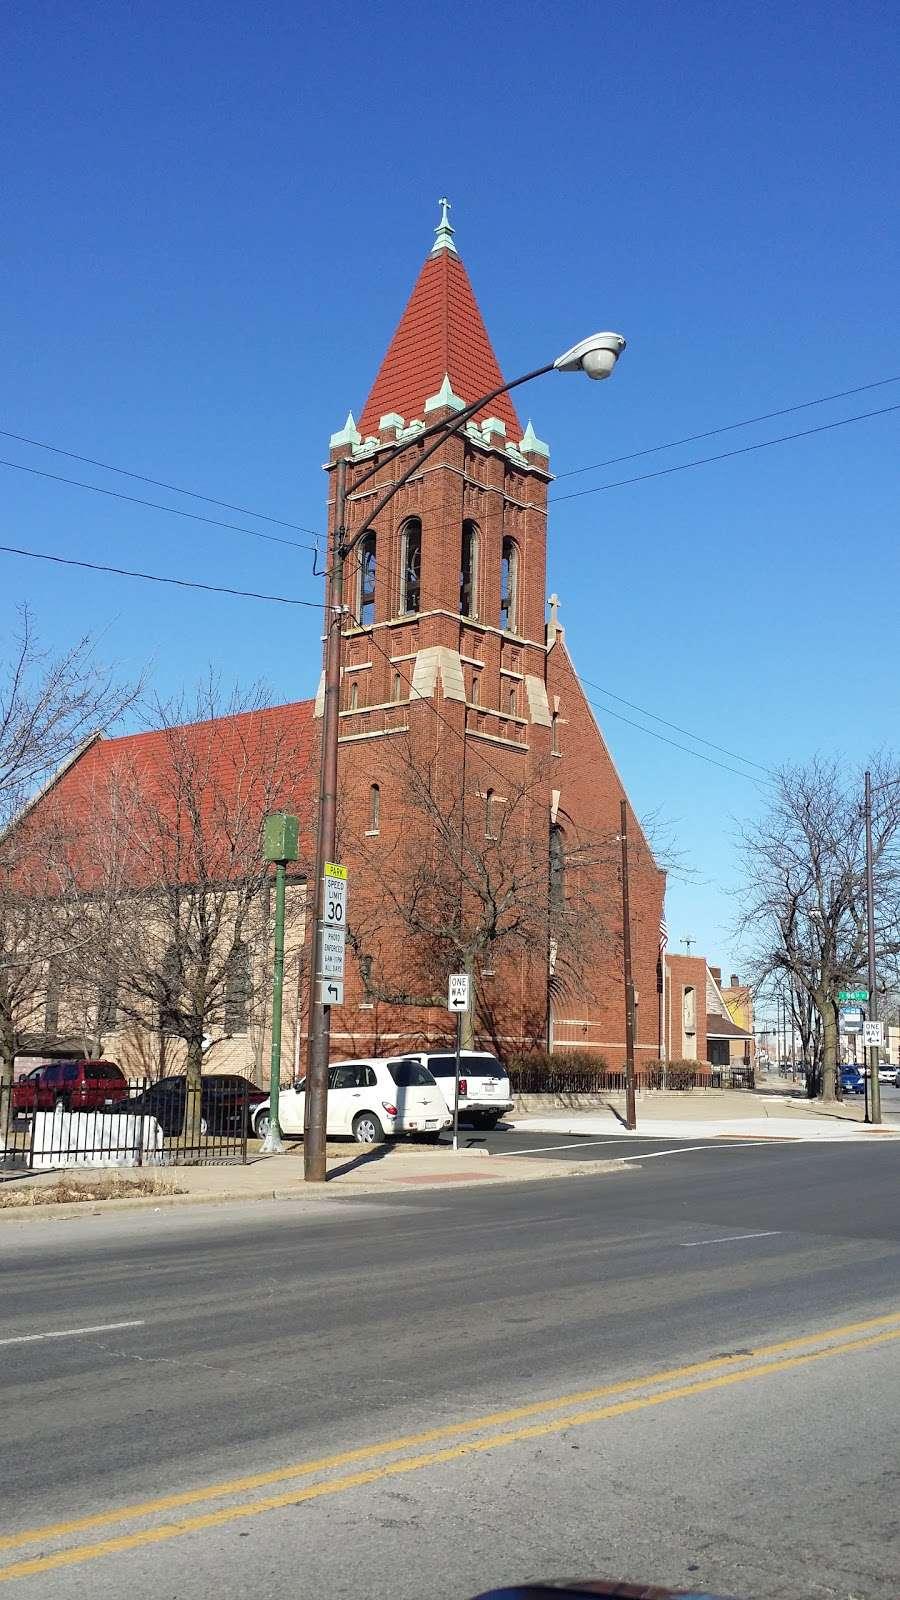 St. George Roman Catholic Church - church  | Photo 10 of 10 | Address: 9546 S Ewing Ave, Chicago, IL 60617, USA | Phone: (773) 734-0554